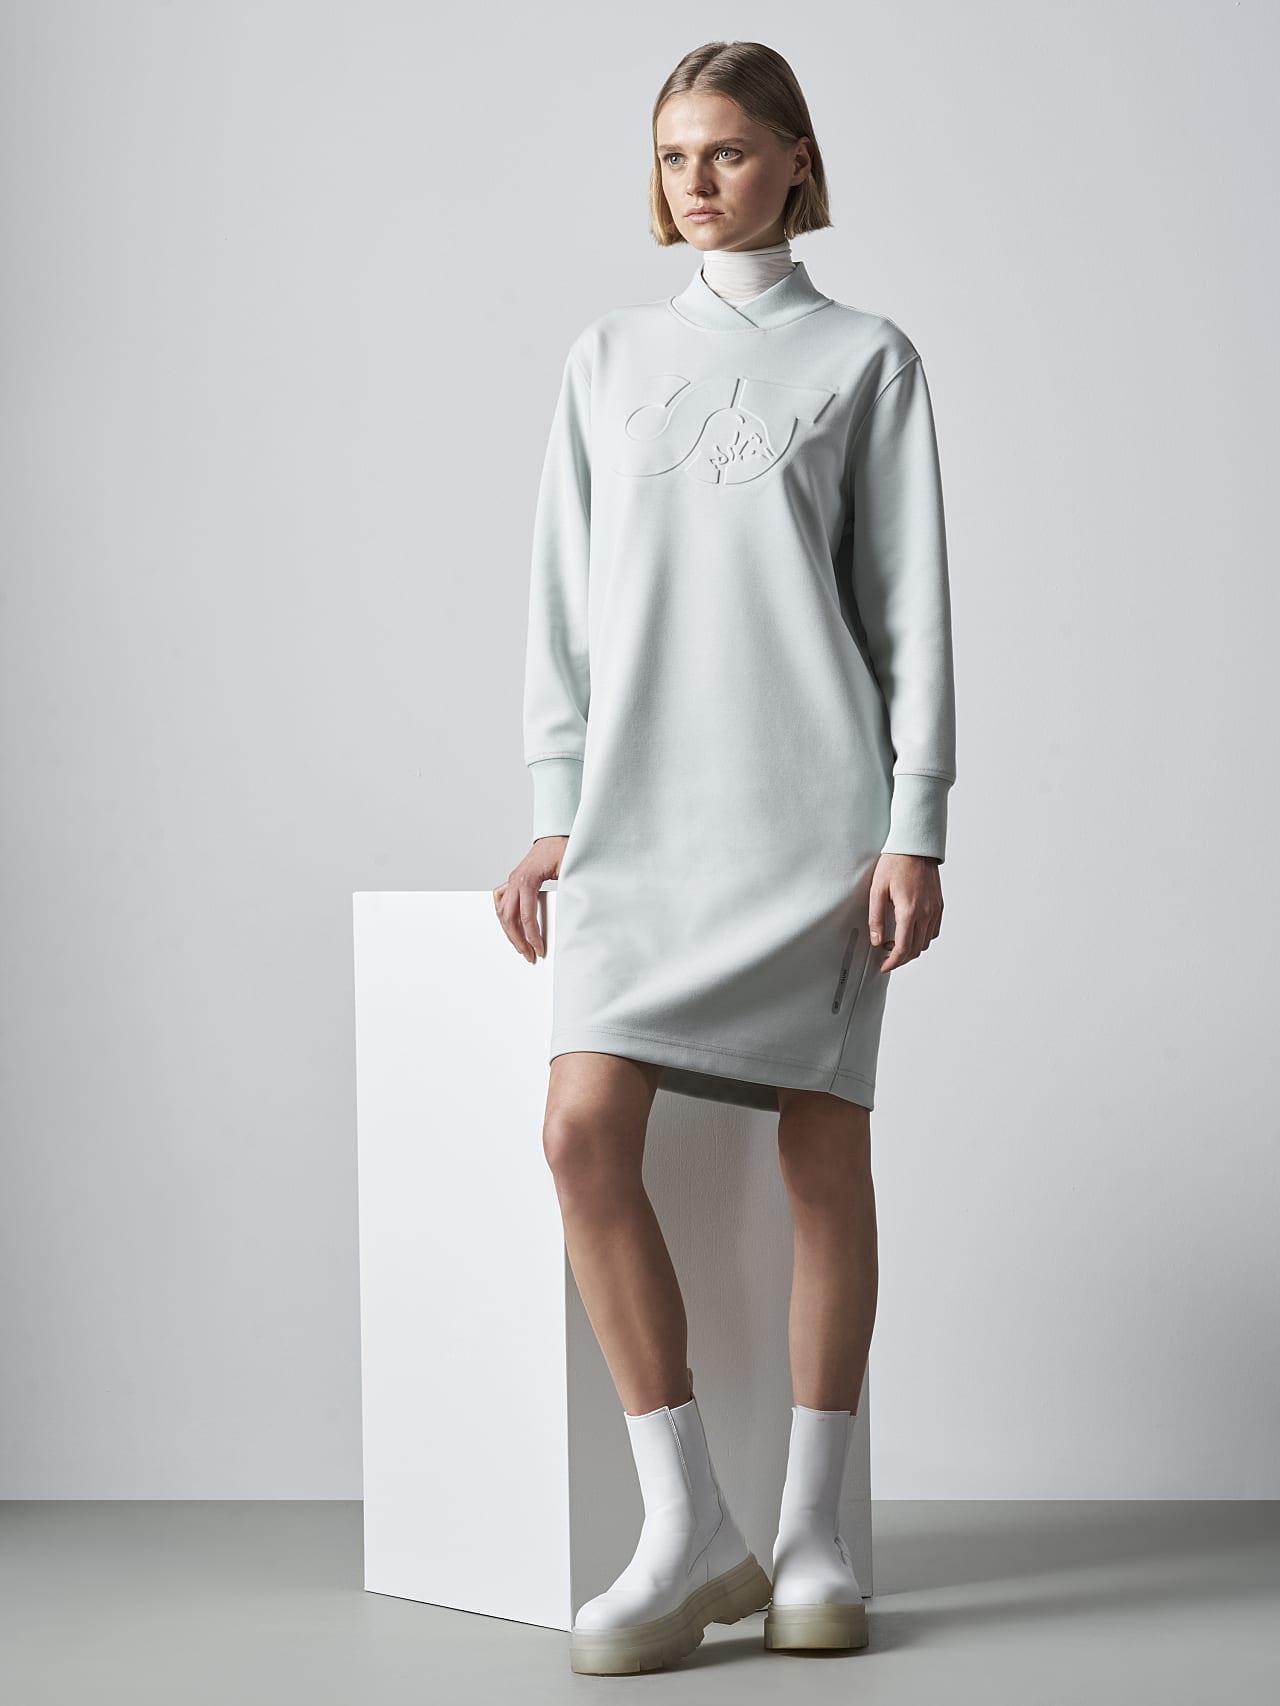 STAR V3.Y5.02 Premium Logo Sweater Dress Pale Blue  Model shot Alpha Tauri